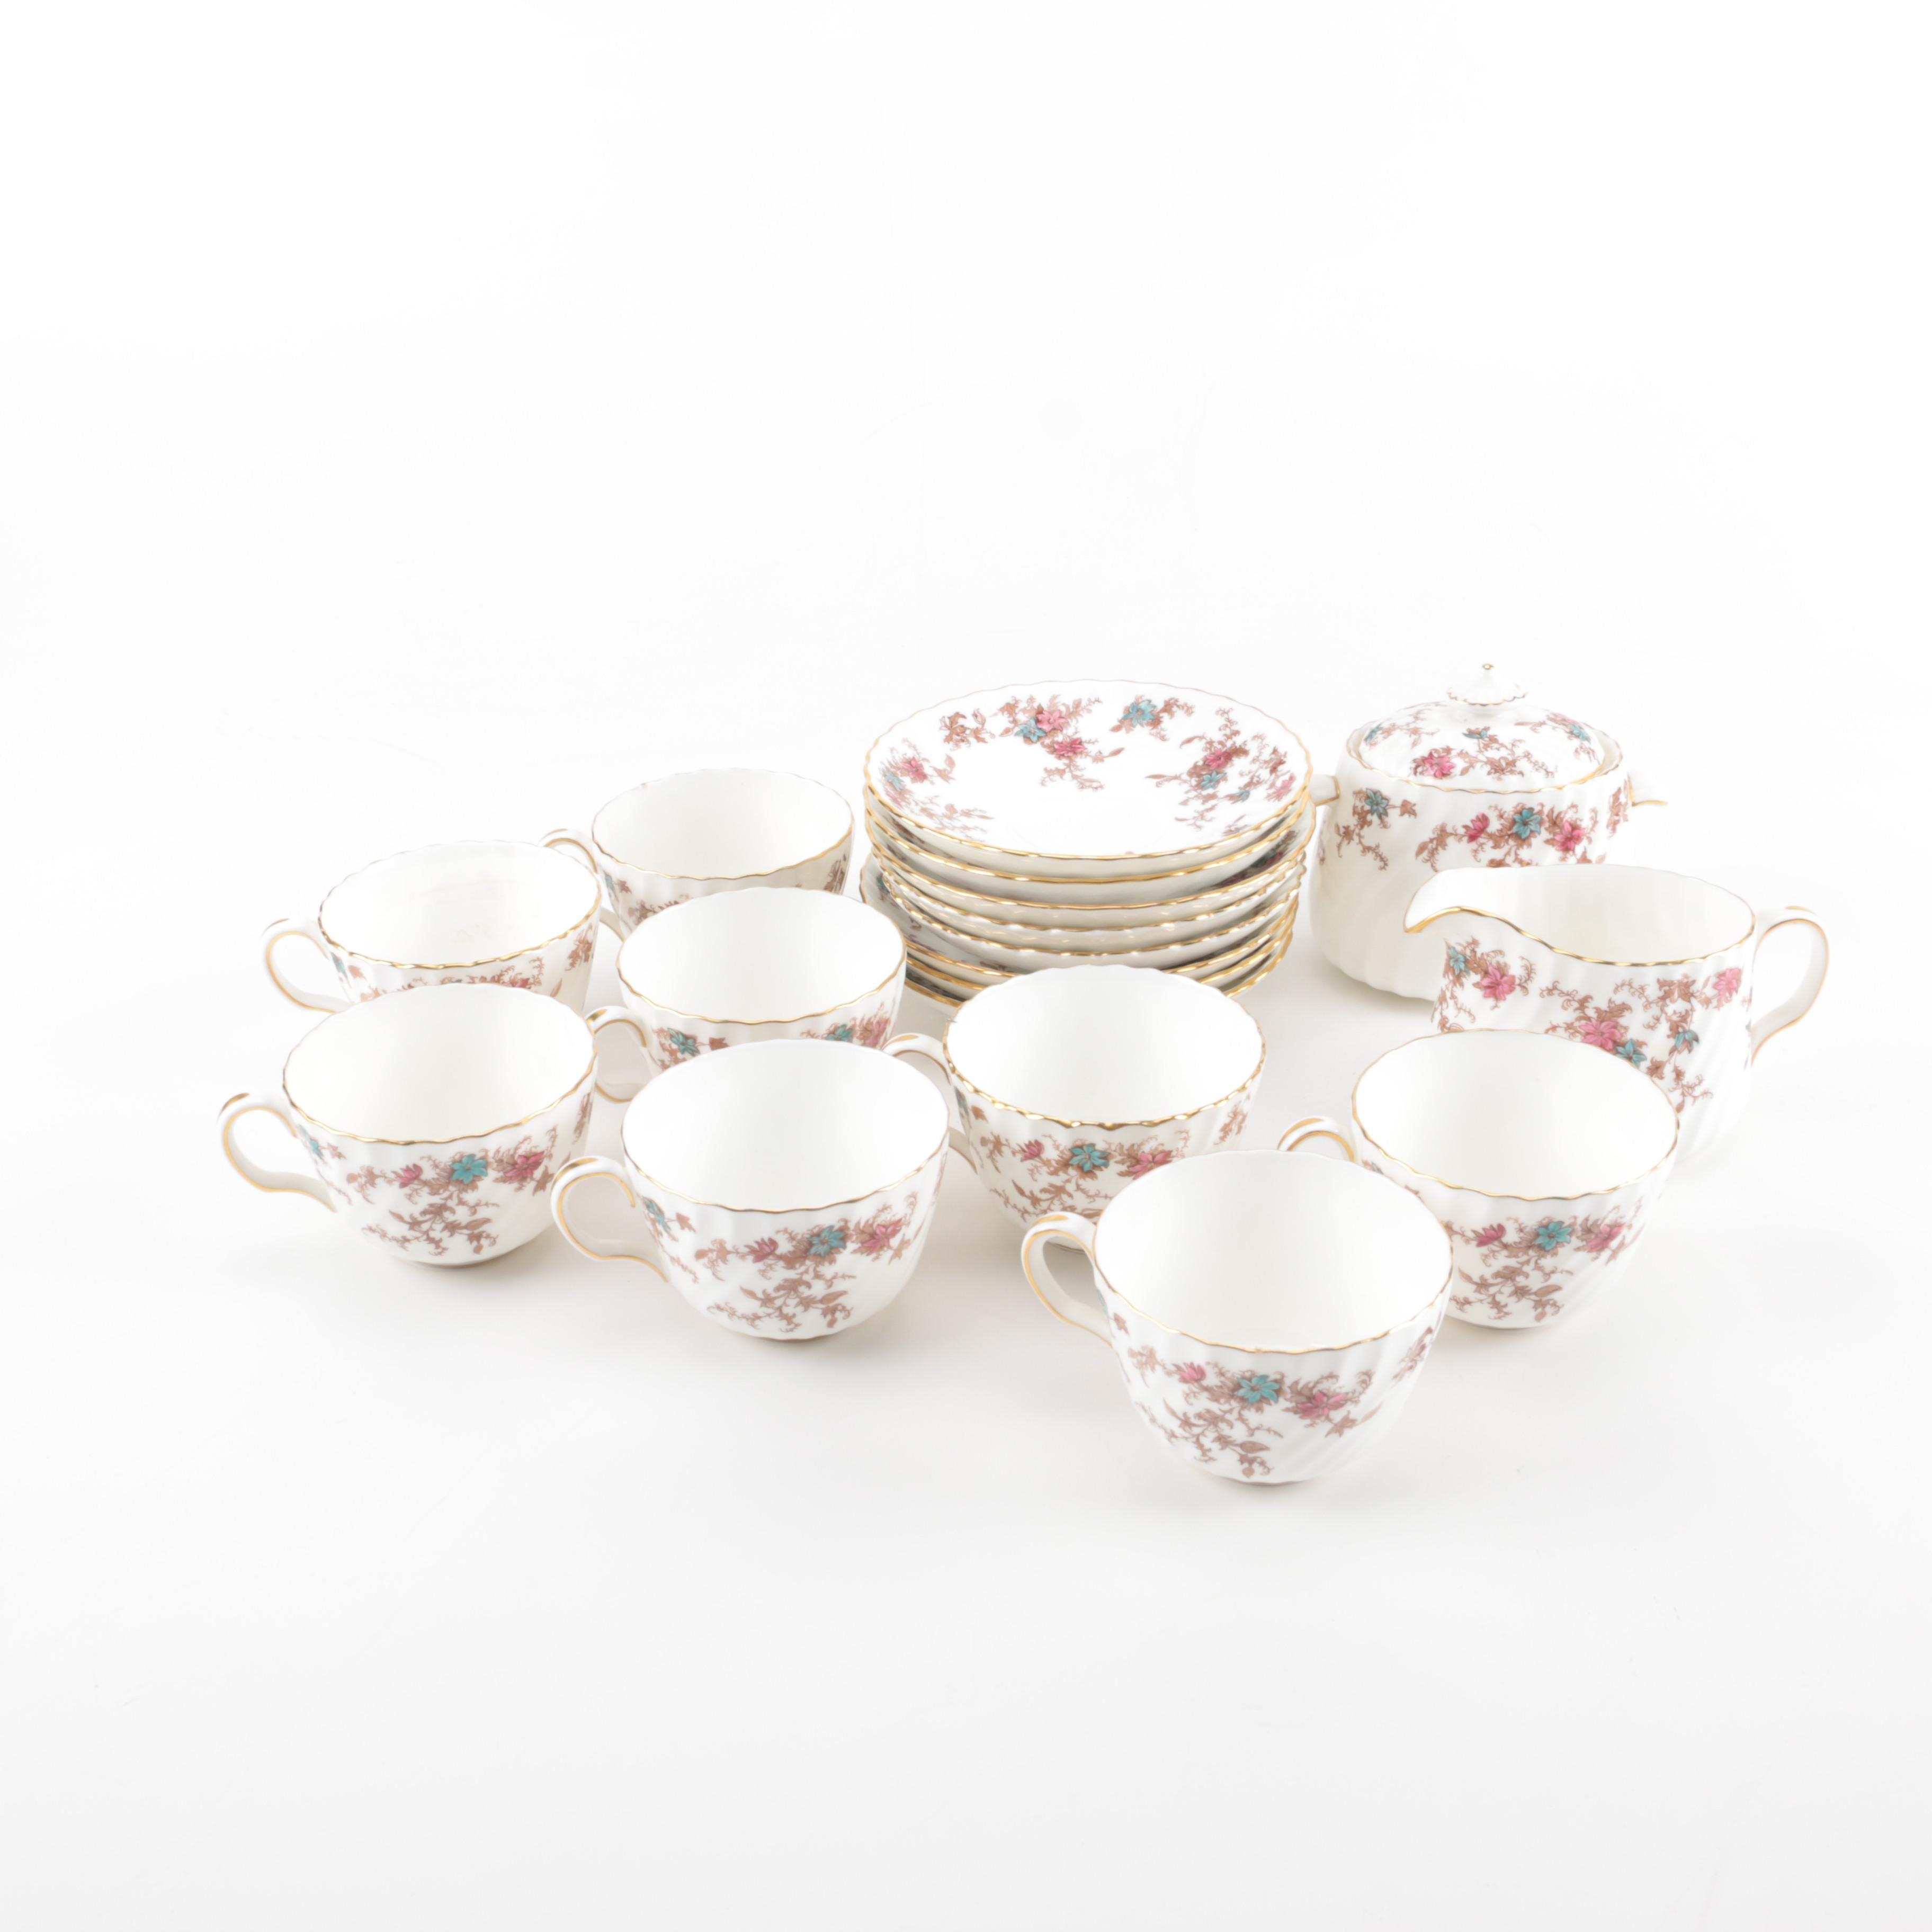 Minton Bone China Tableware Set